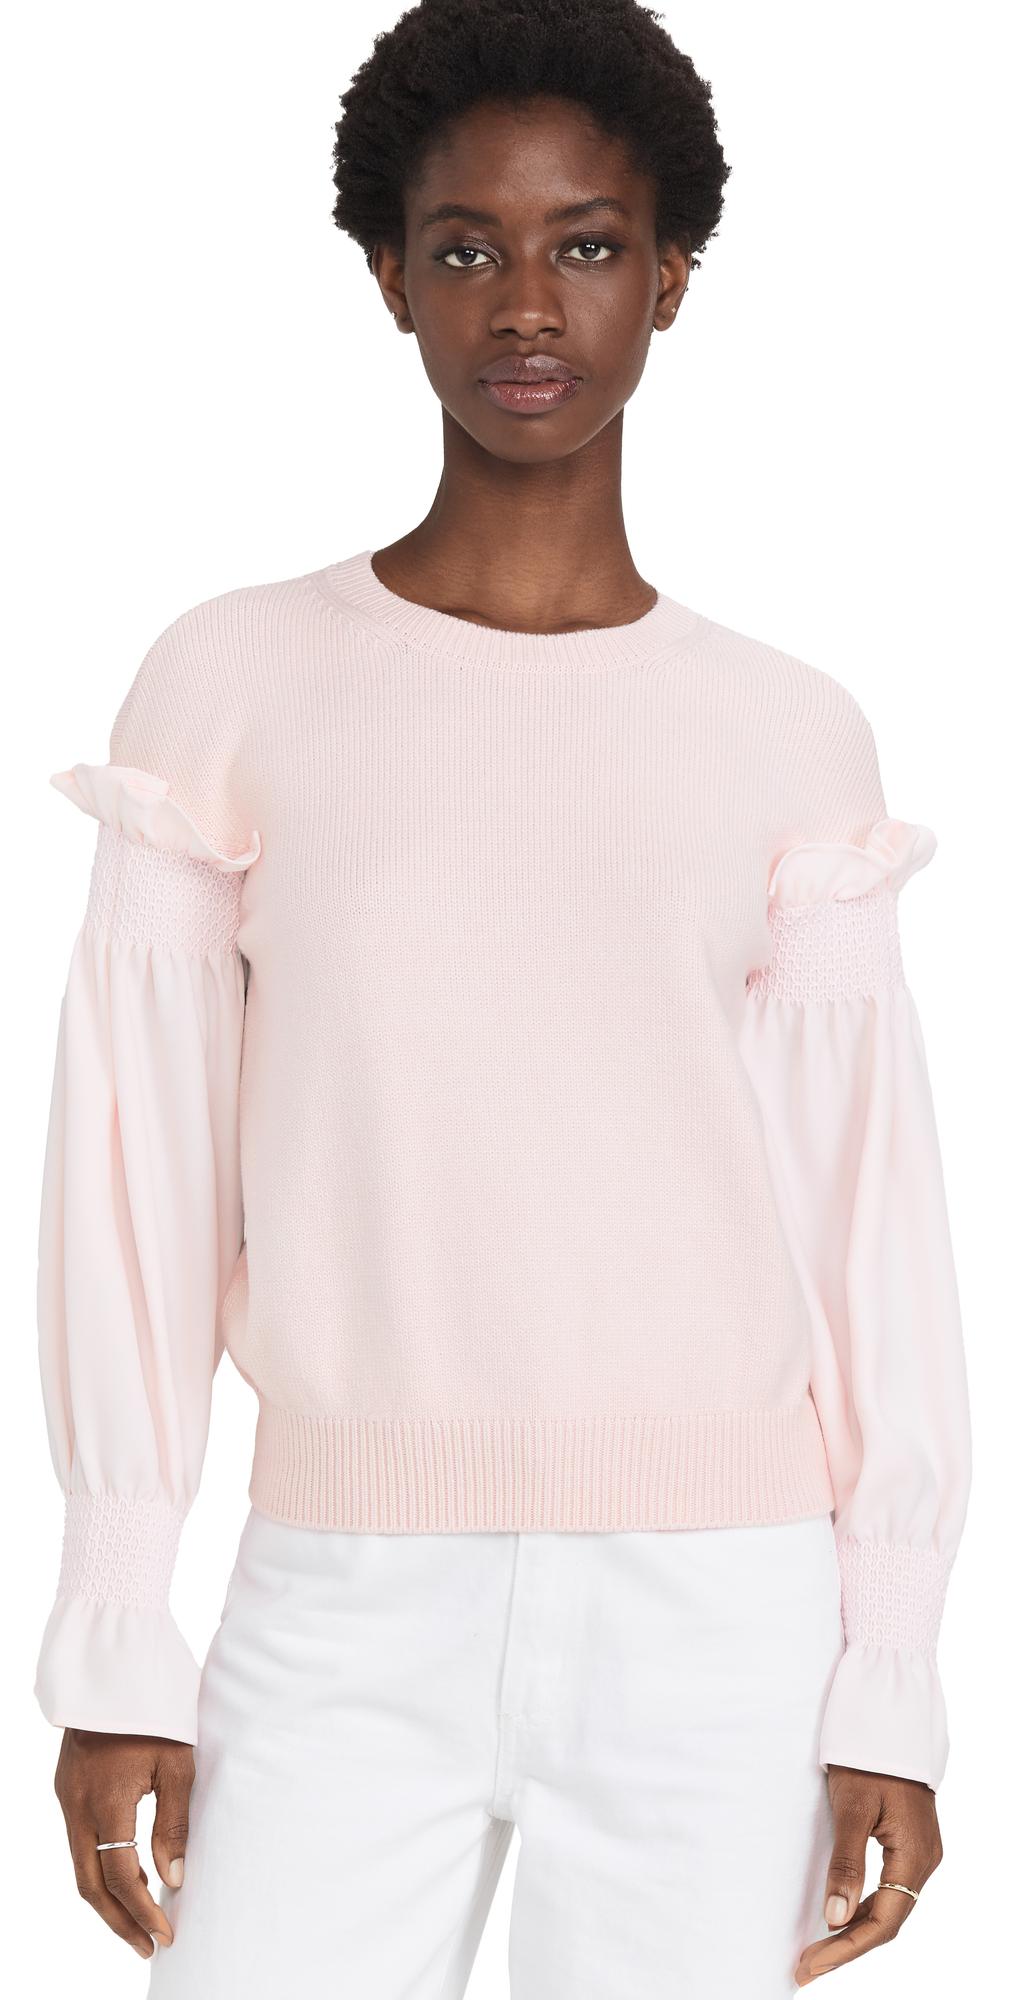 Hemlock Sweater